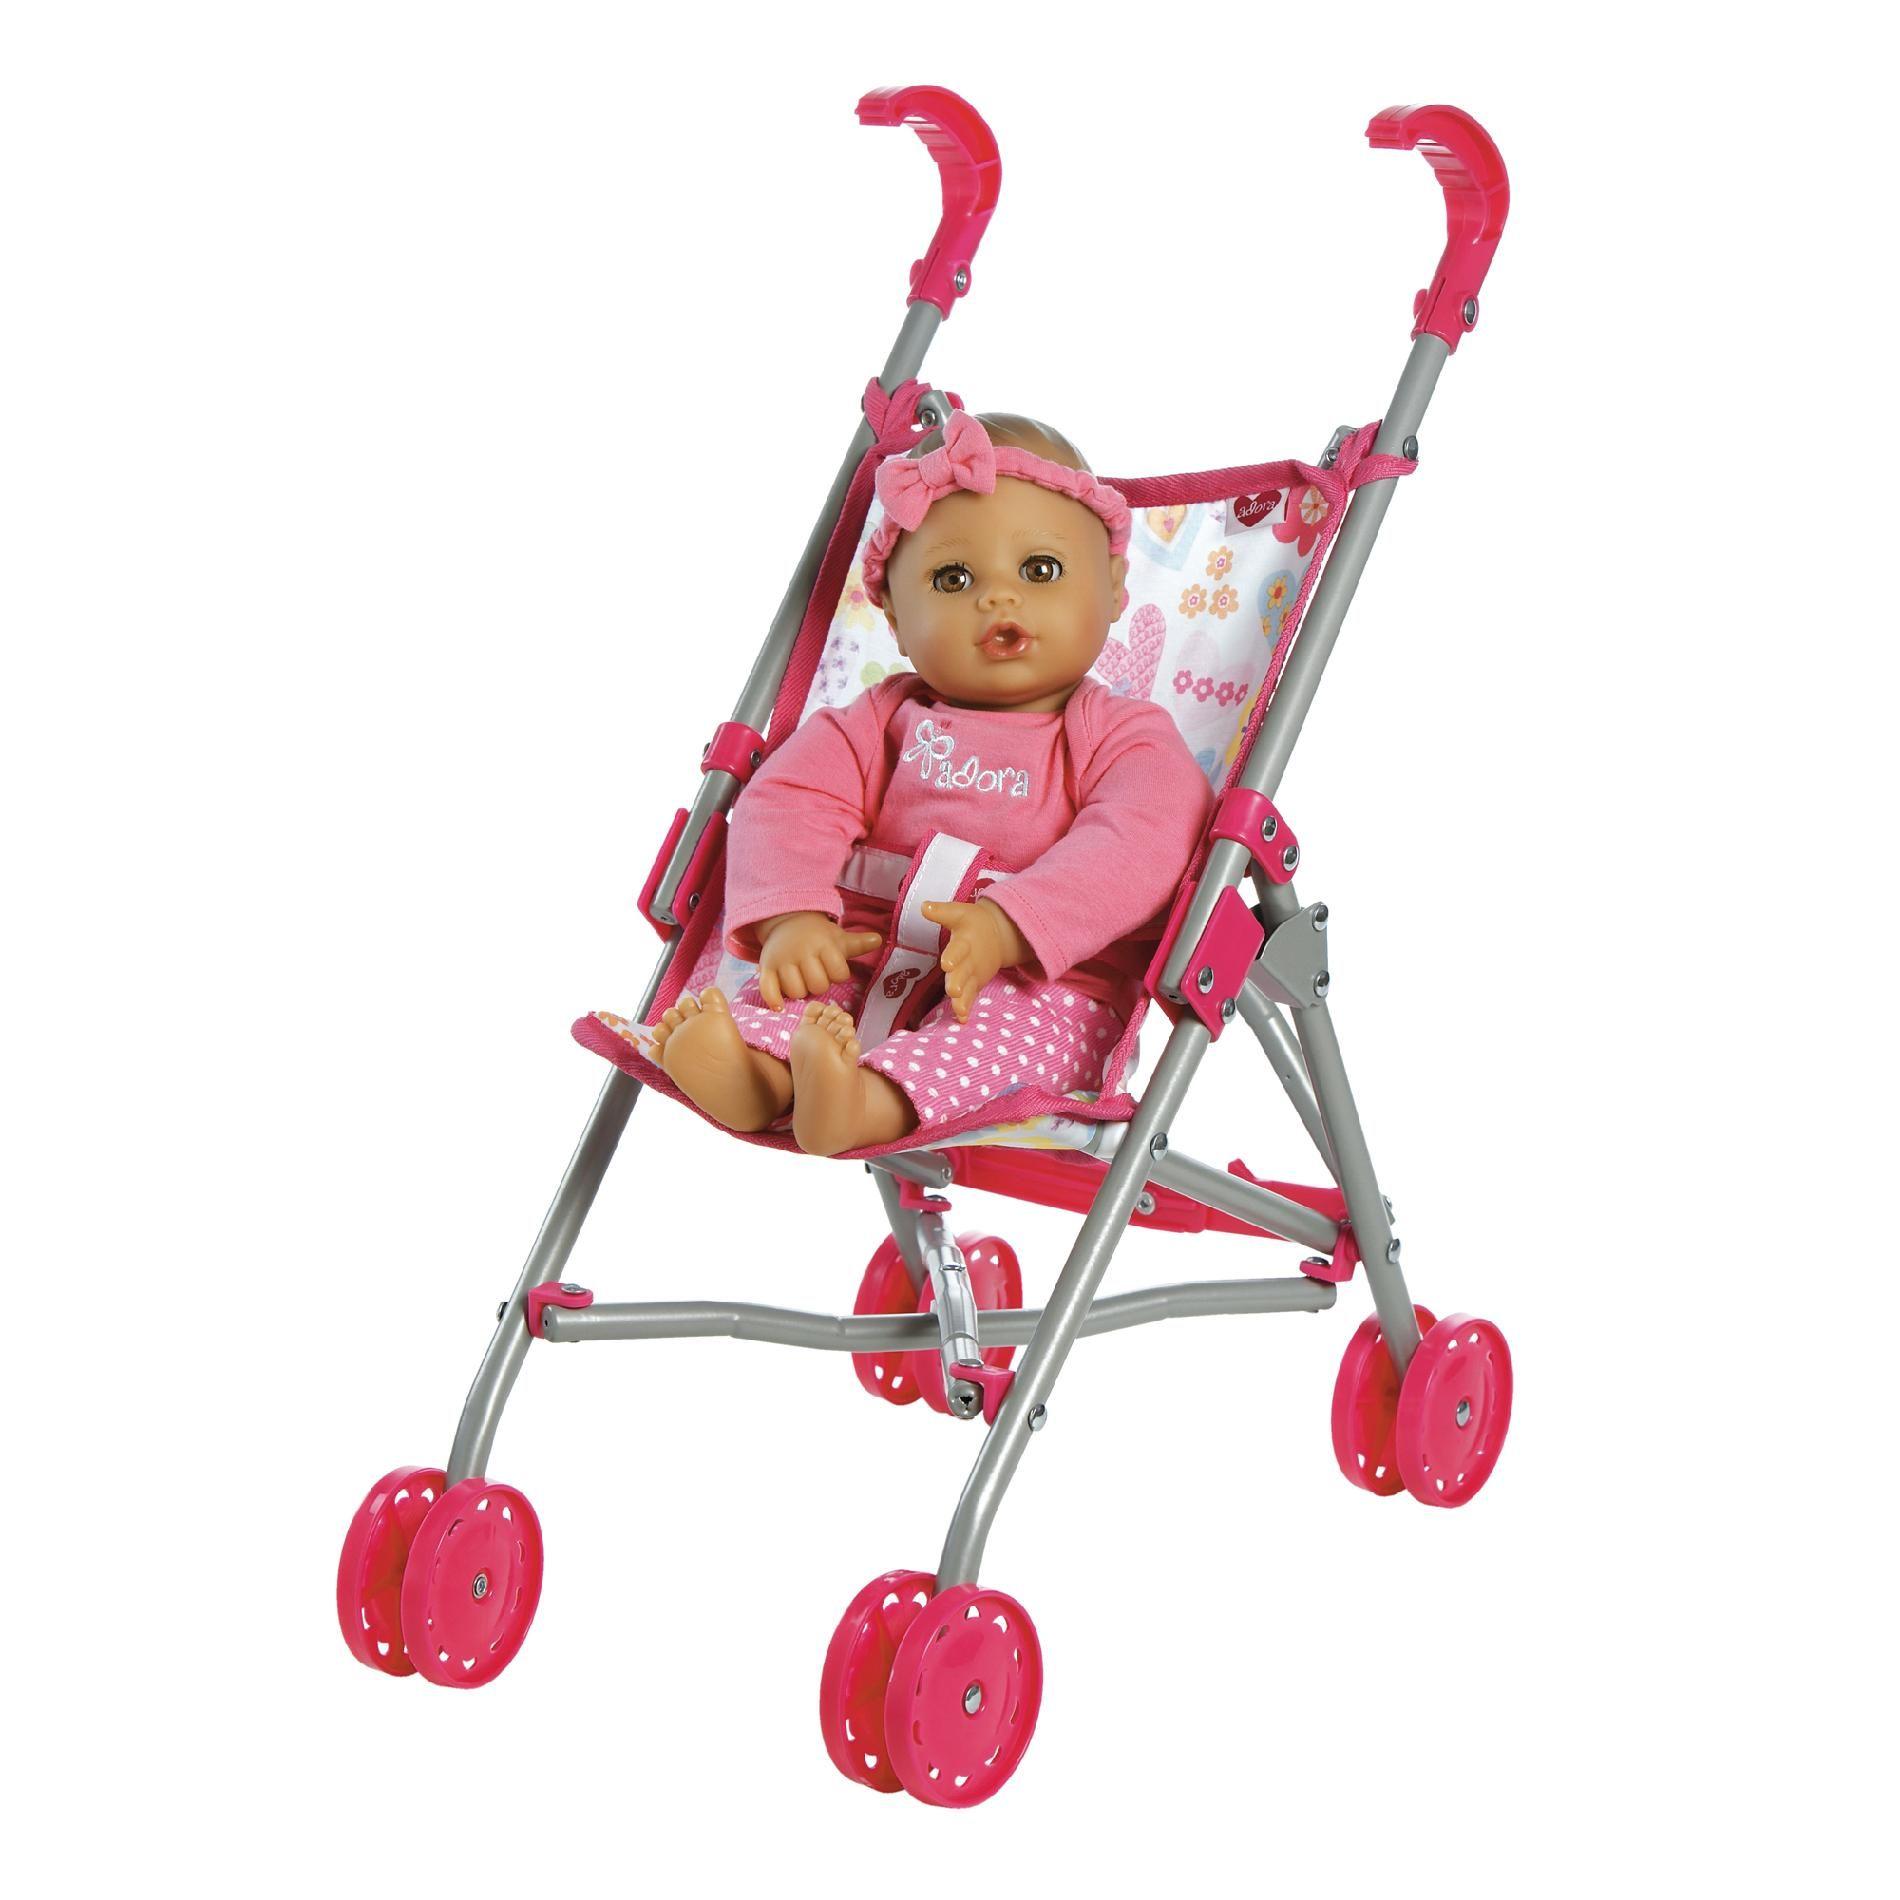 Adora Dolls Doll Accessories, Small Umbrella Stroller, Pink